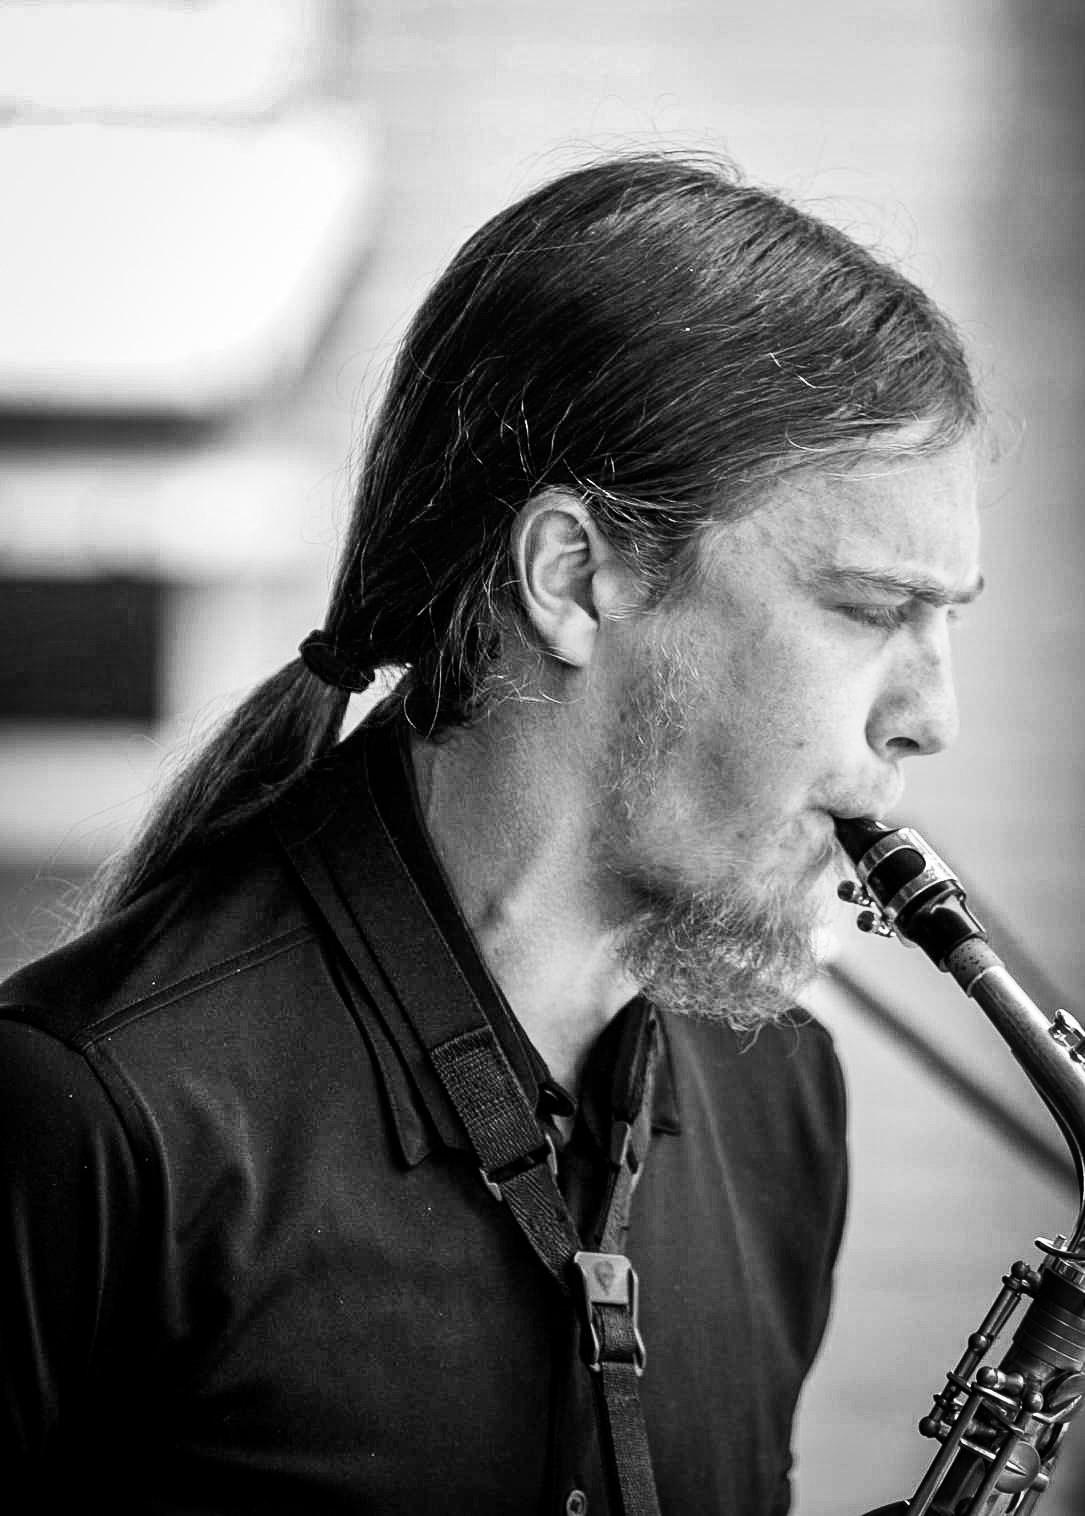 Daniel playing the sax